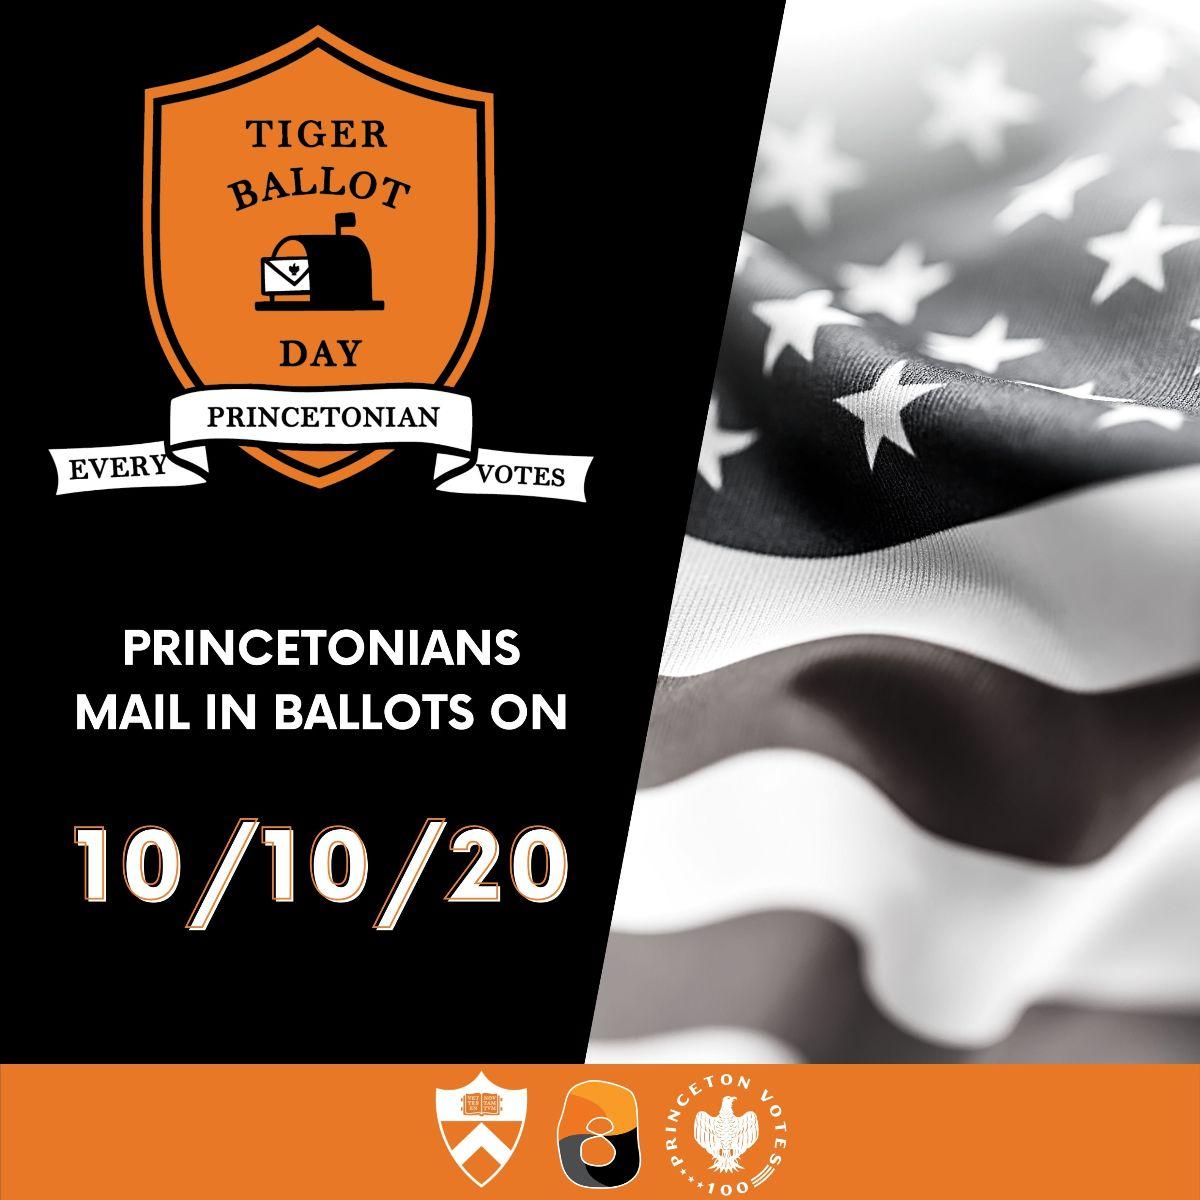 Tiger Ballot Day poster